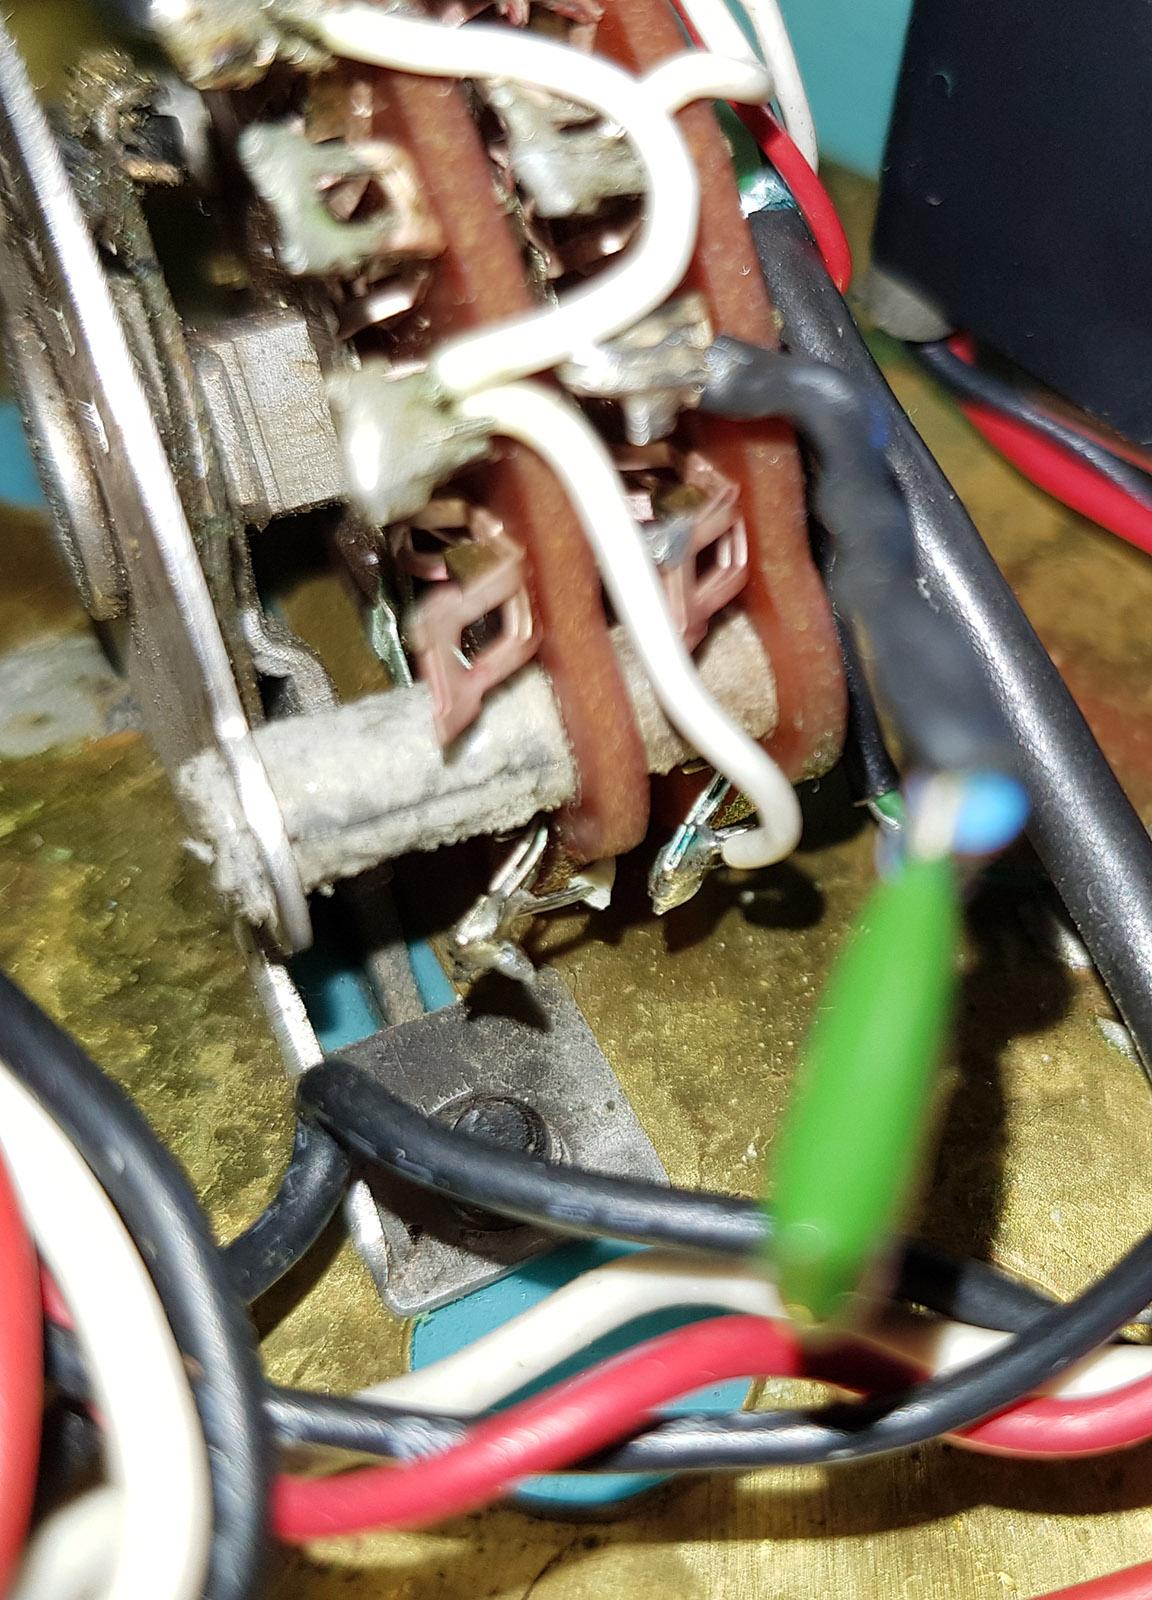 gtr 014  jackson 88 limited edition dingens2k carvin humbucker wiring diagram